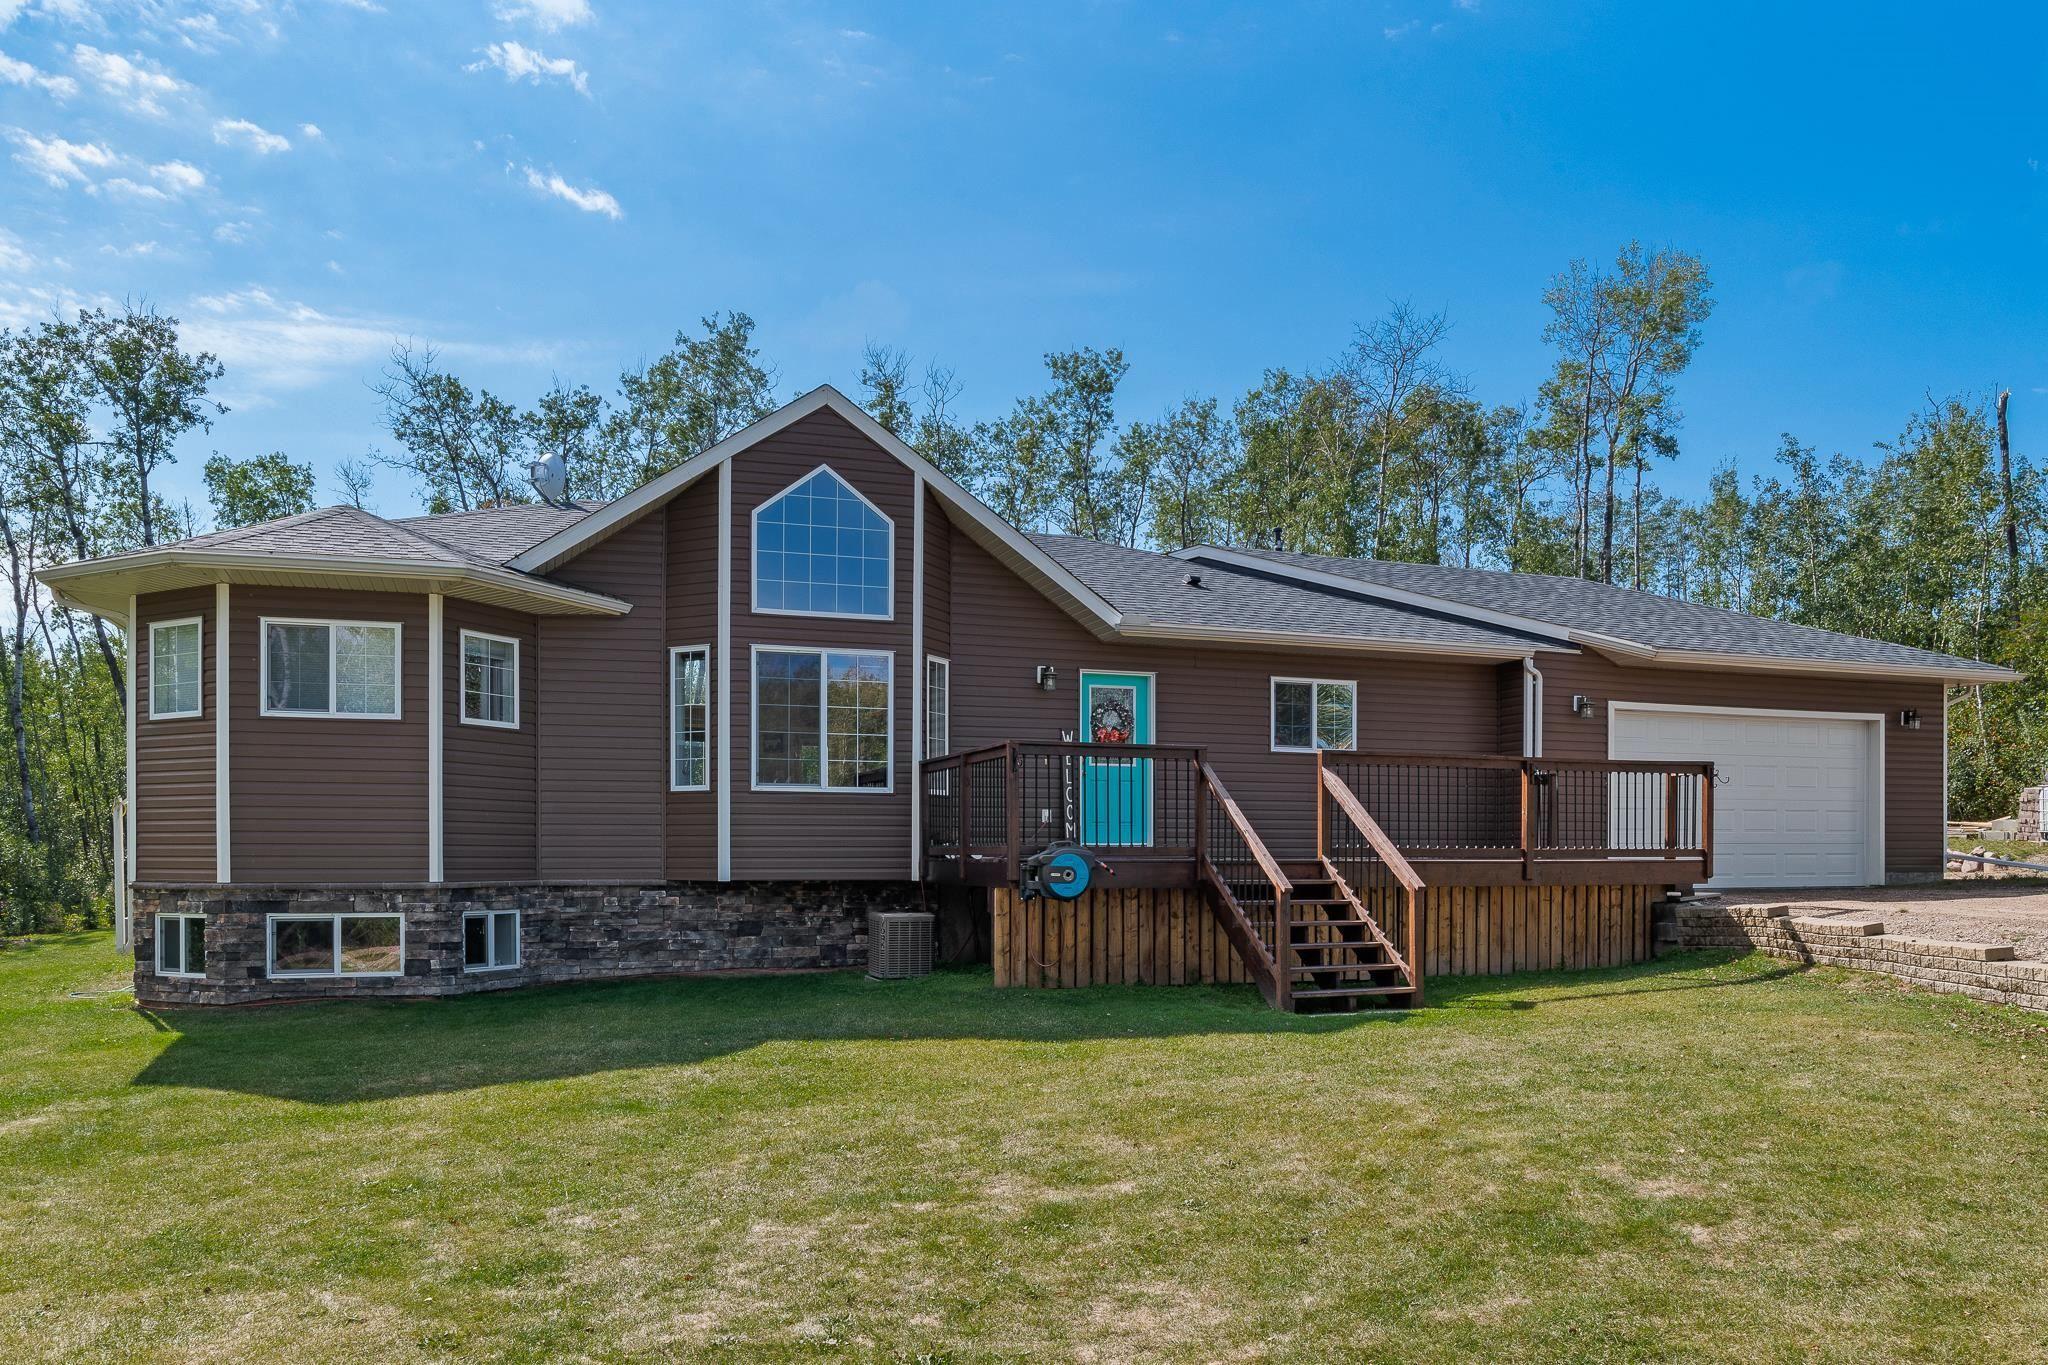 Main Photo: 62029 Rge Rd 421: Rural Bonnyville M.D. House for sale : MLS®# E4260433